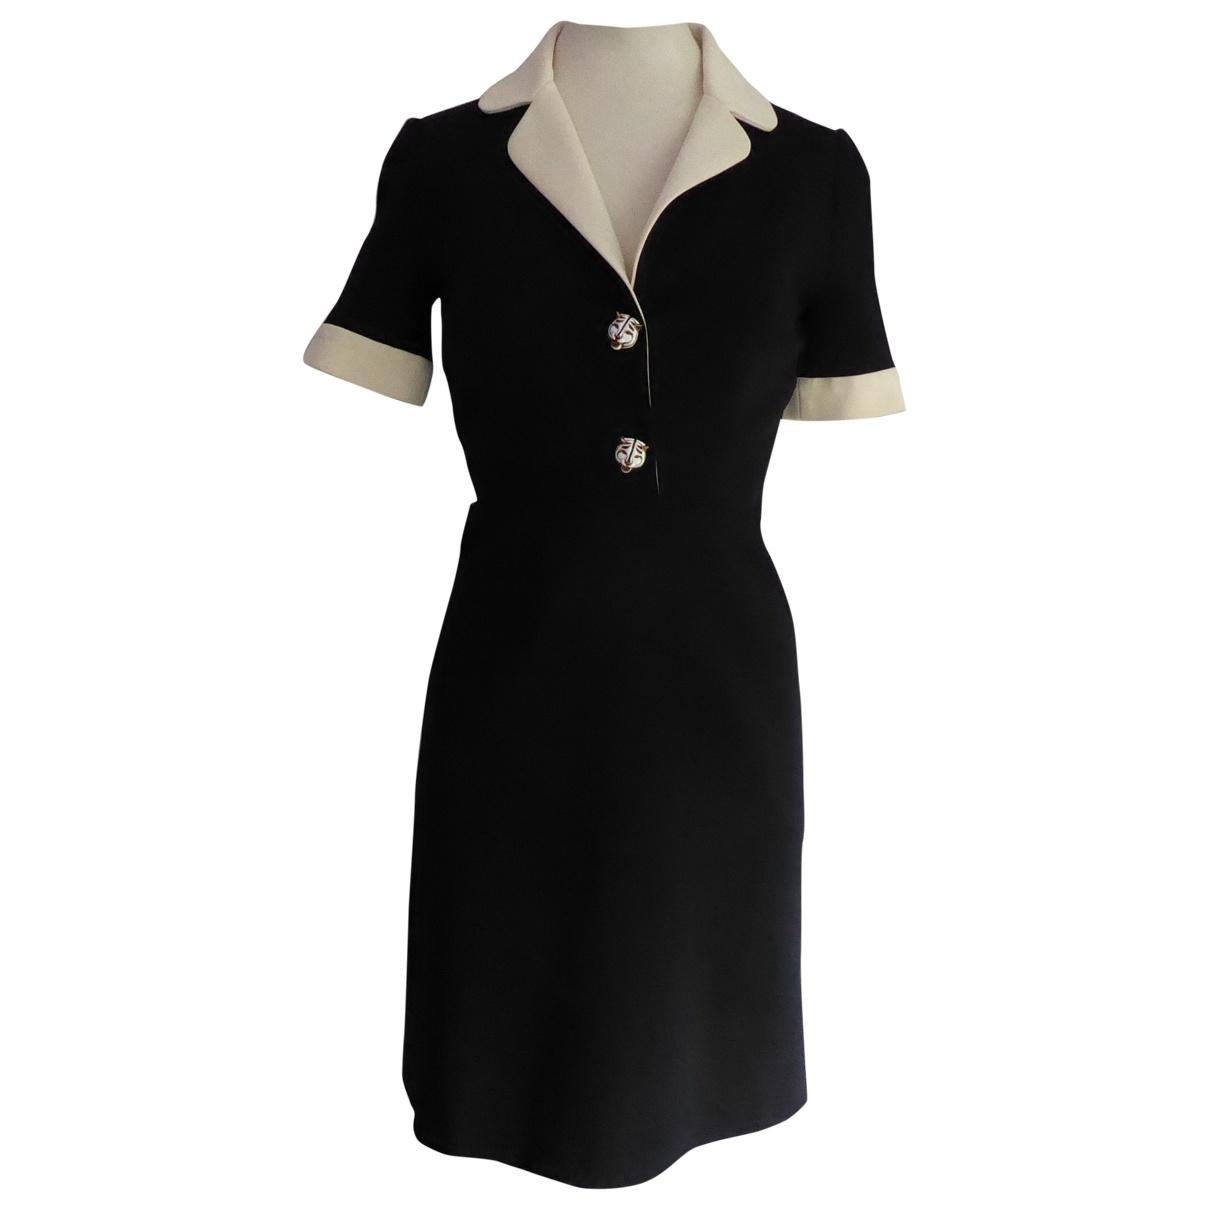 Gucci \N Black dress for Women S International